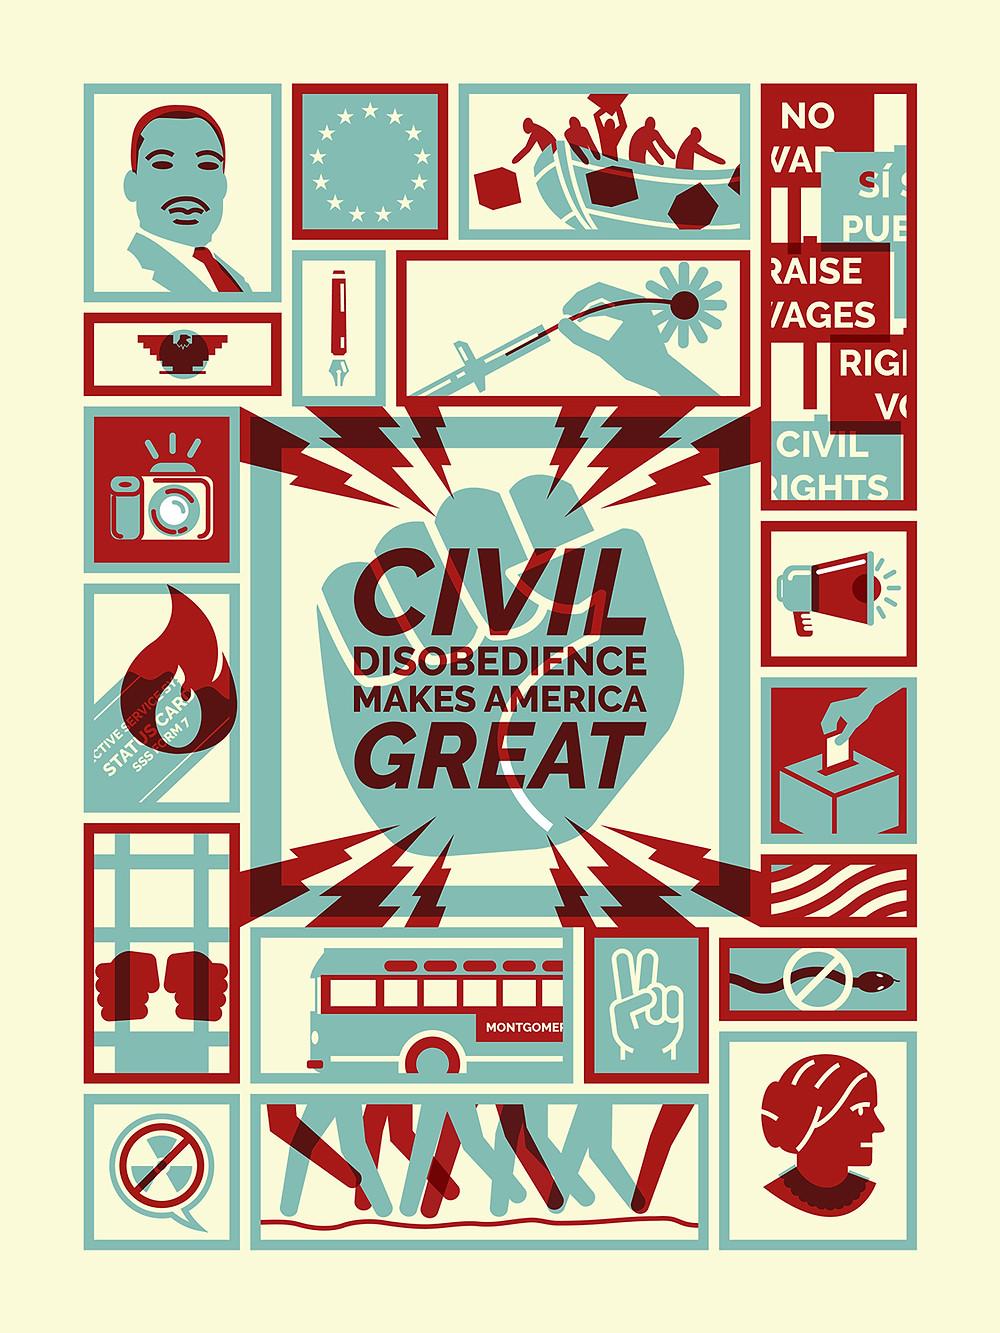 Civil-Disobedience-by-Michael-Czerniawski